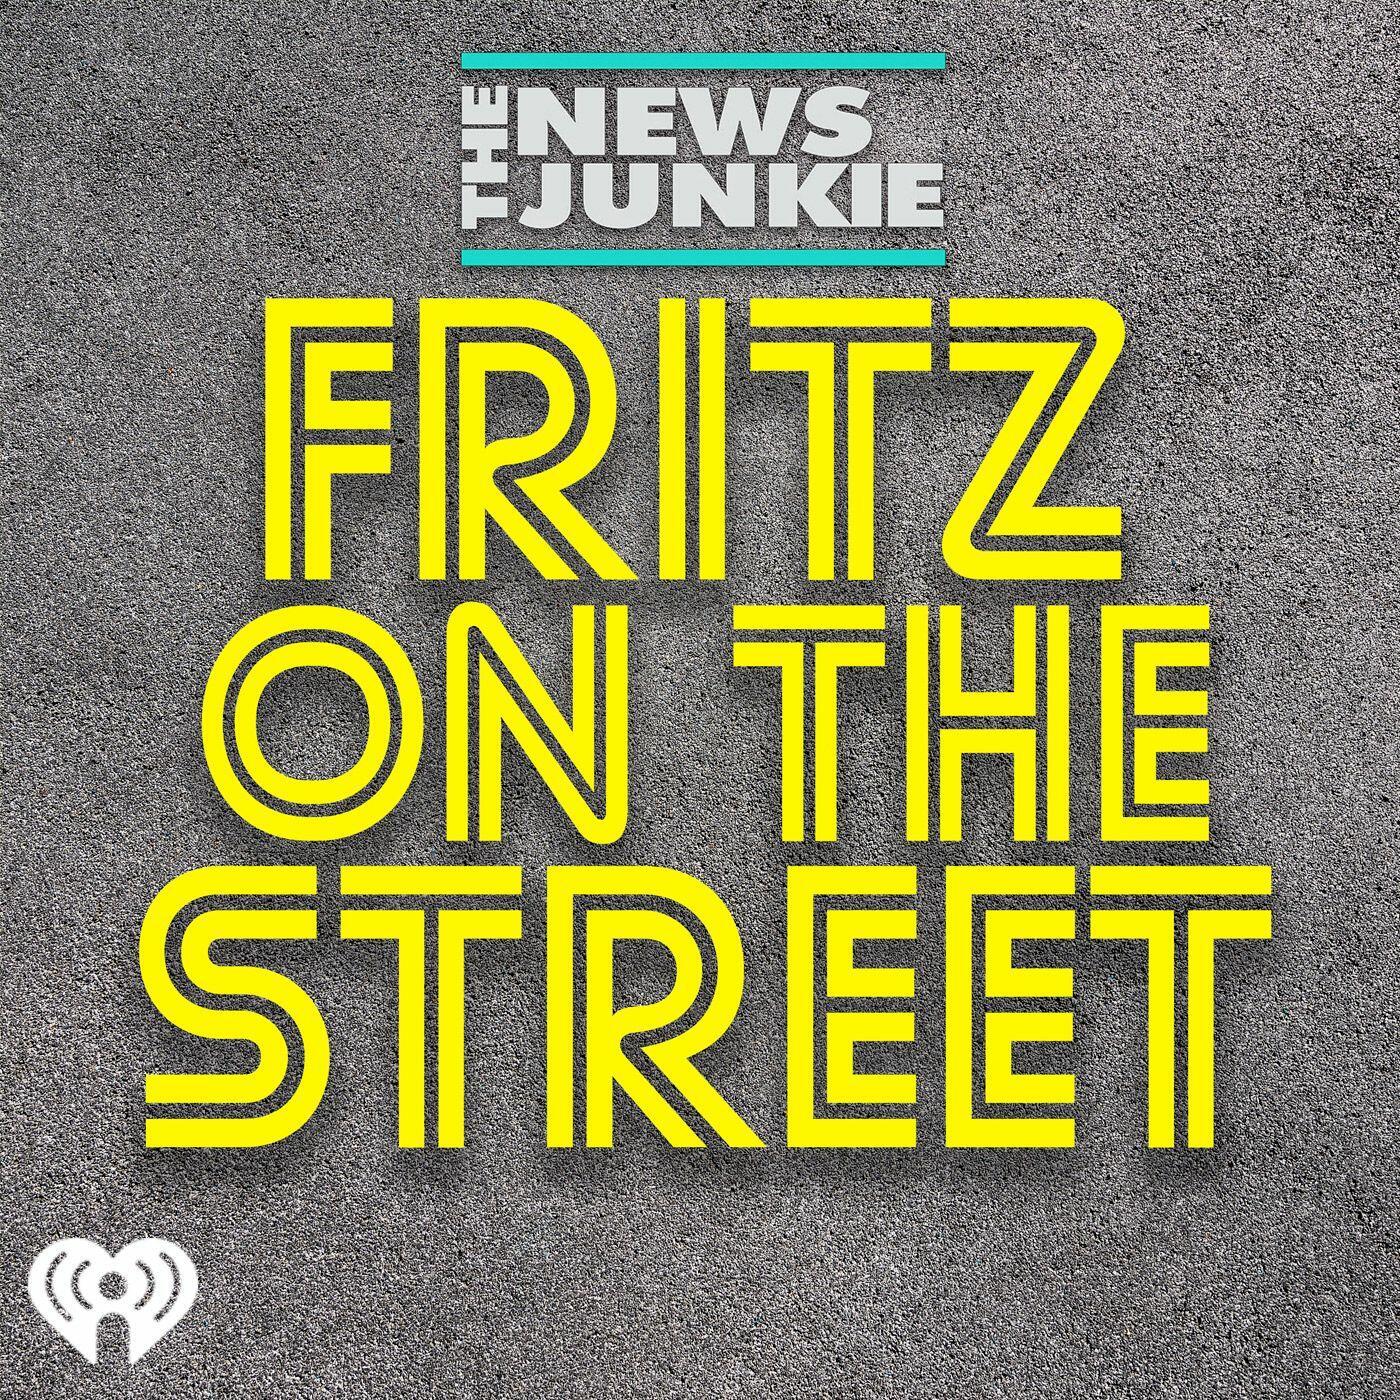 Fritz on the Street